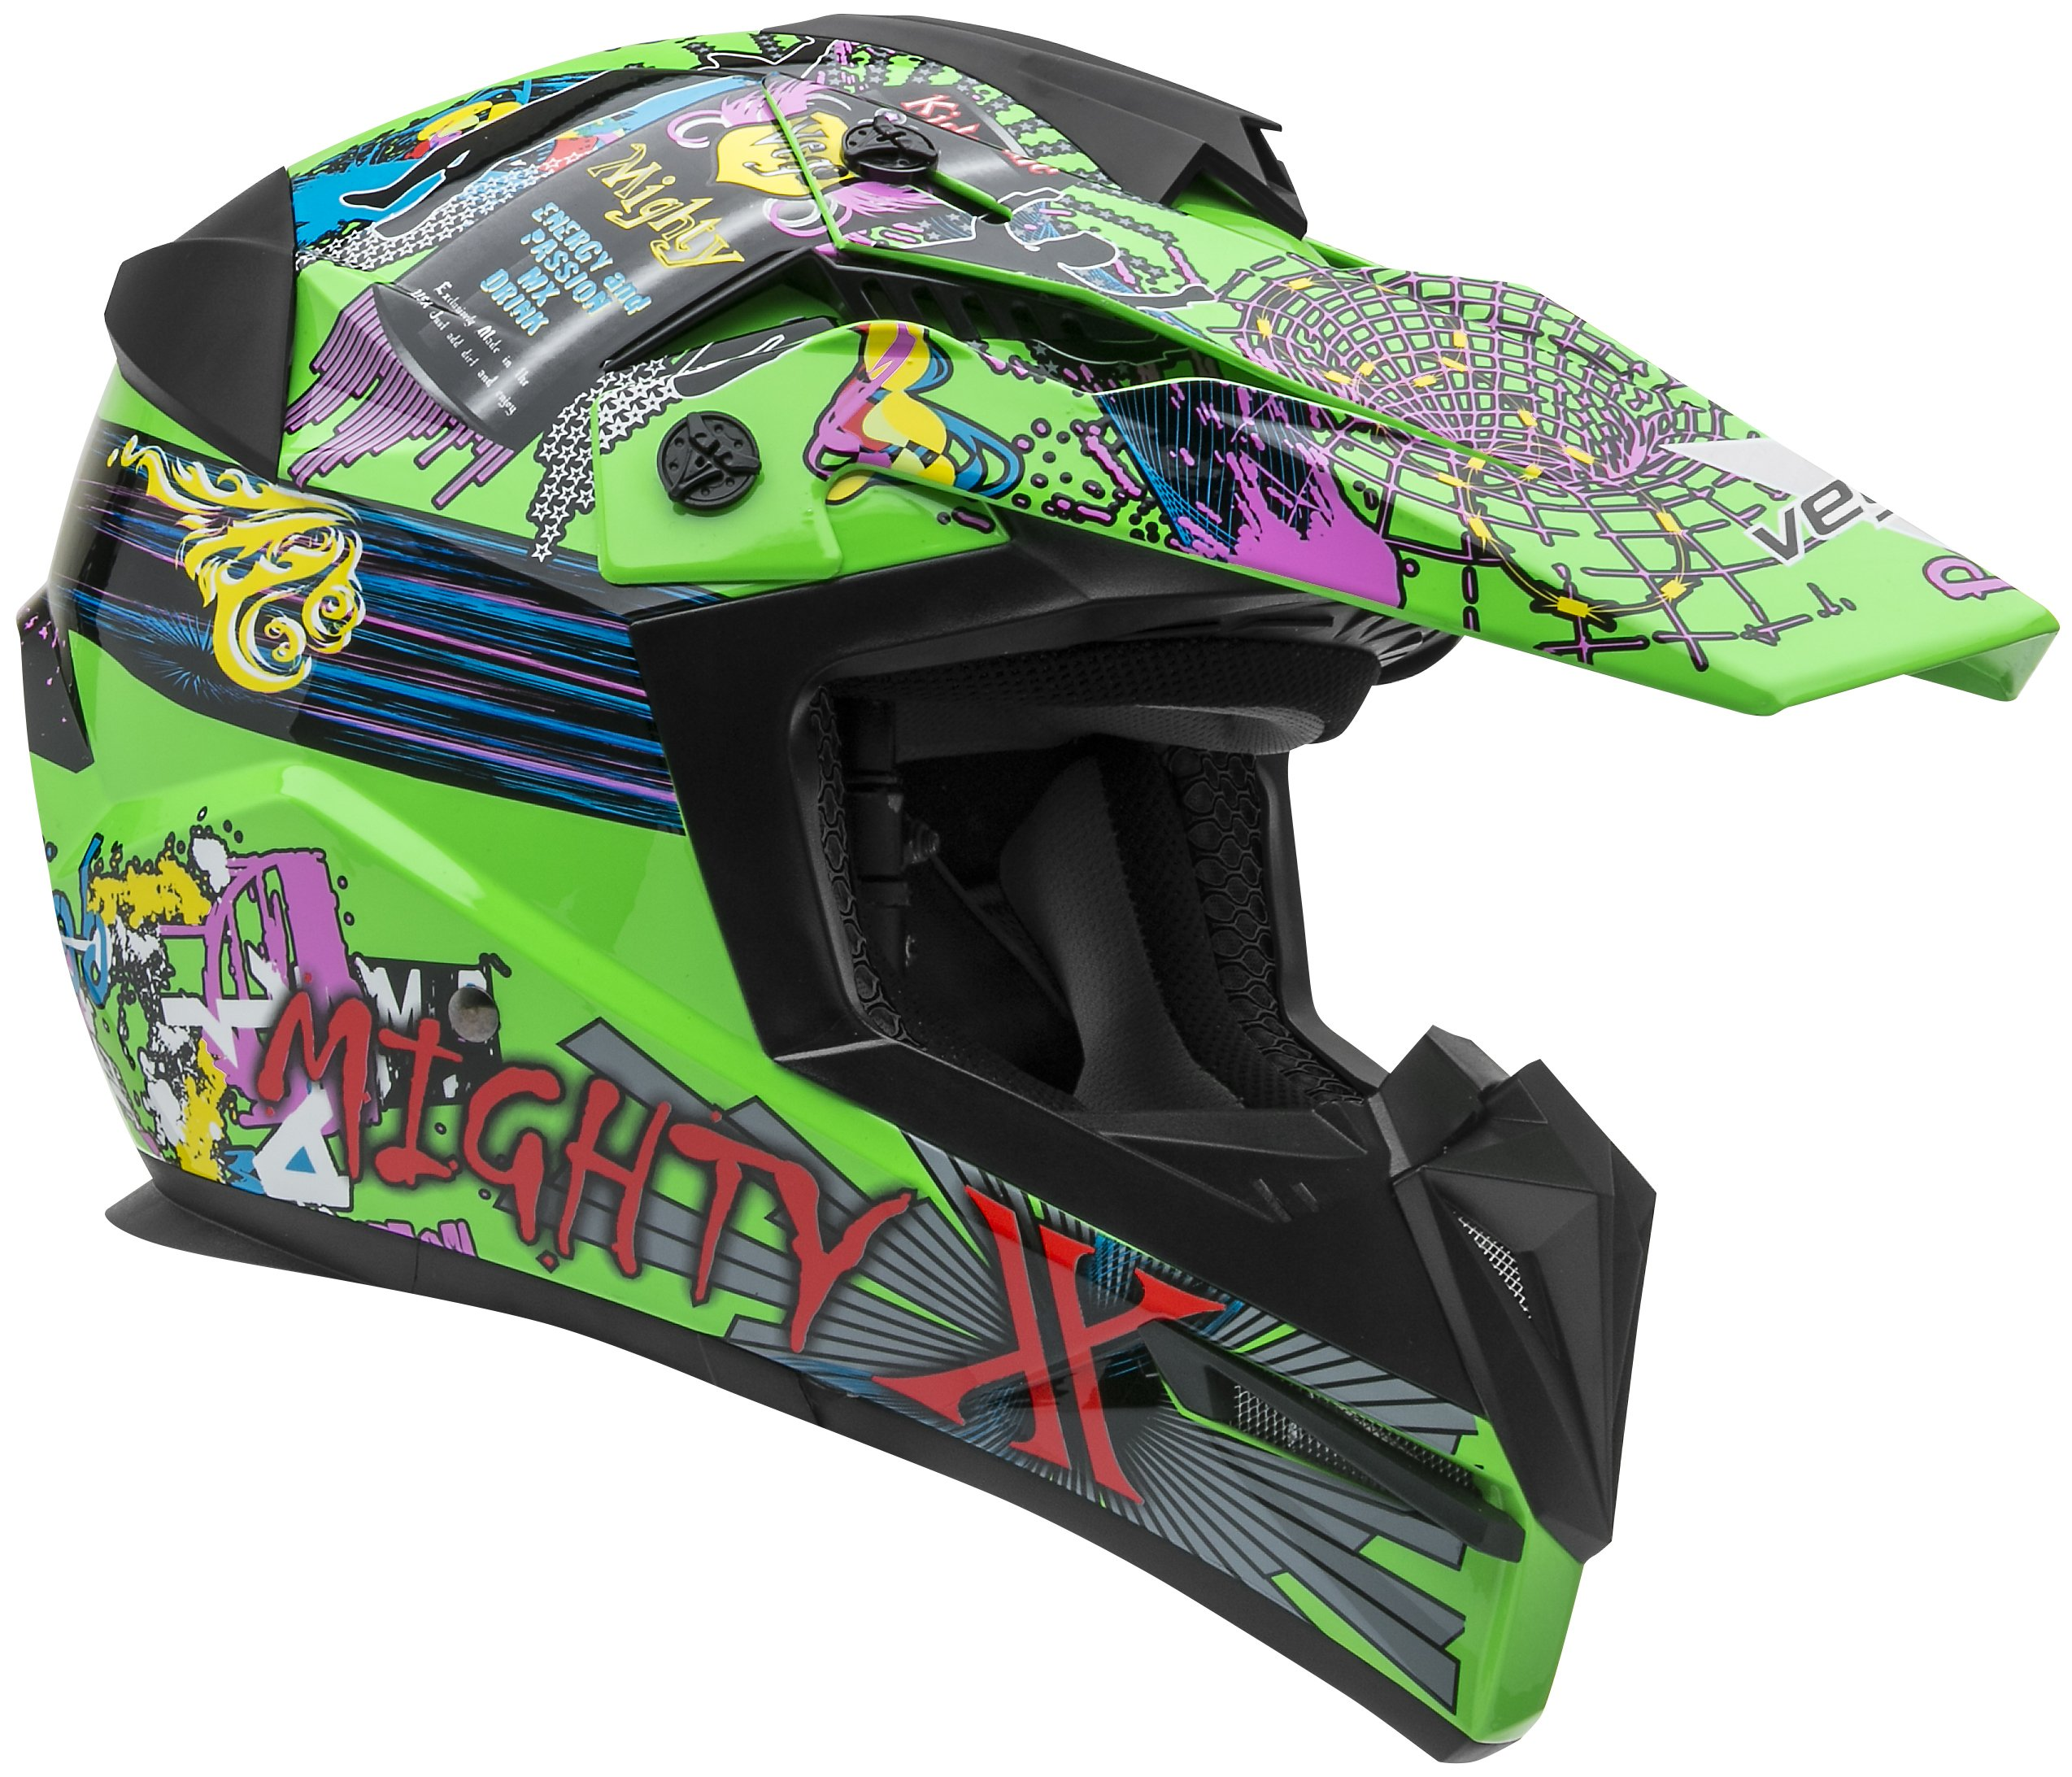 Vega Helmets MIGHTY X Kids Youth Dirt Bike Helmet – Motocross Full Face Helmet for Off-Road ATV MX Enduro Quad Sport, 5 Year Warranty (Super Fly Graphic,Small)